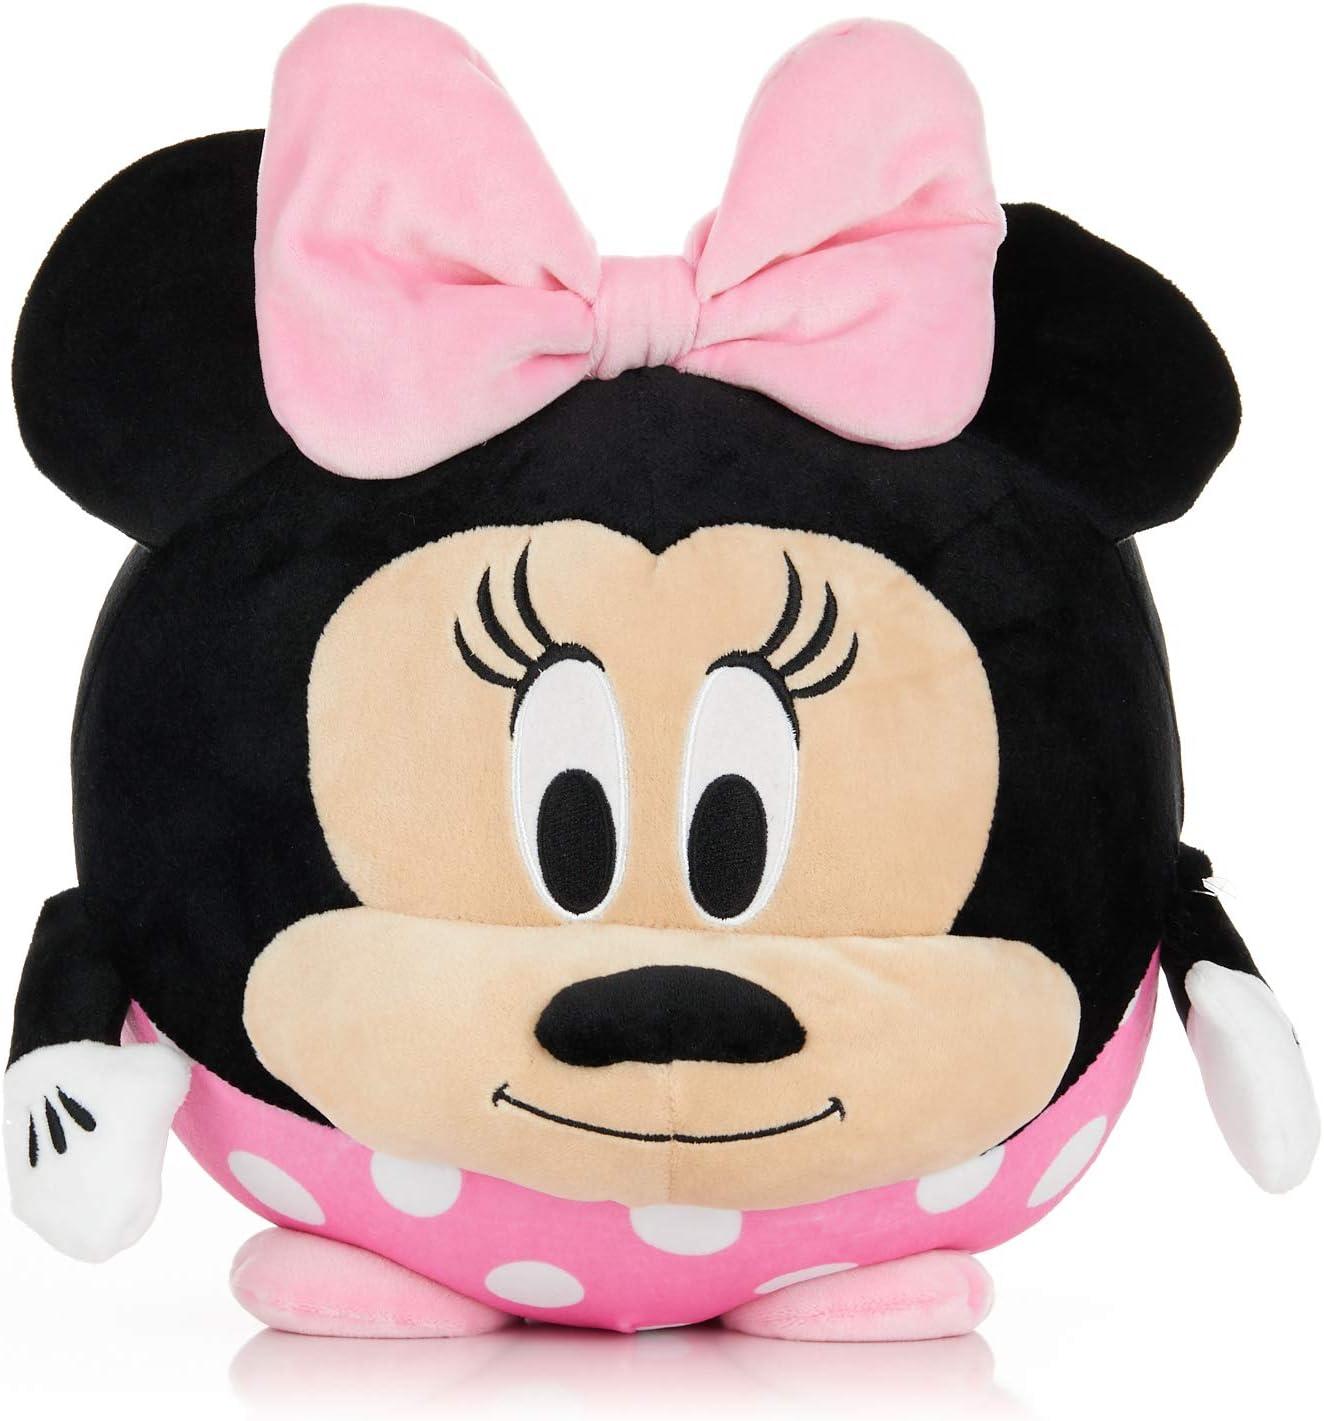 Disney Baby Dumbo Cuddle Pal Stuffed Animal Plush Toy 10 Inches